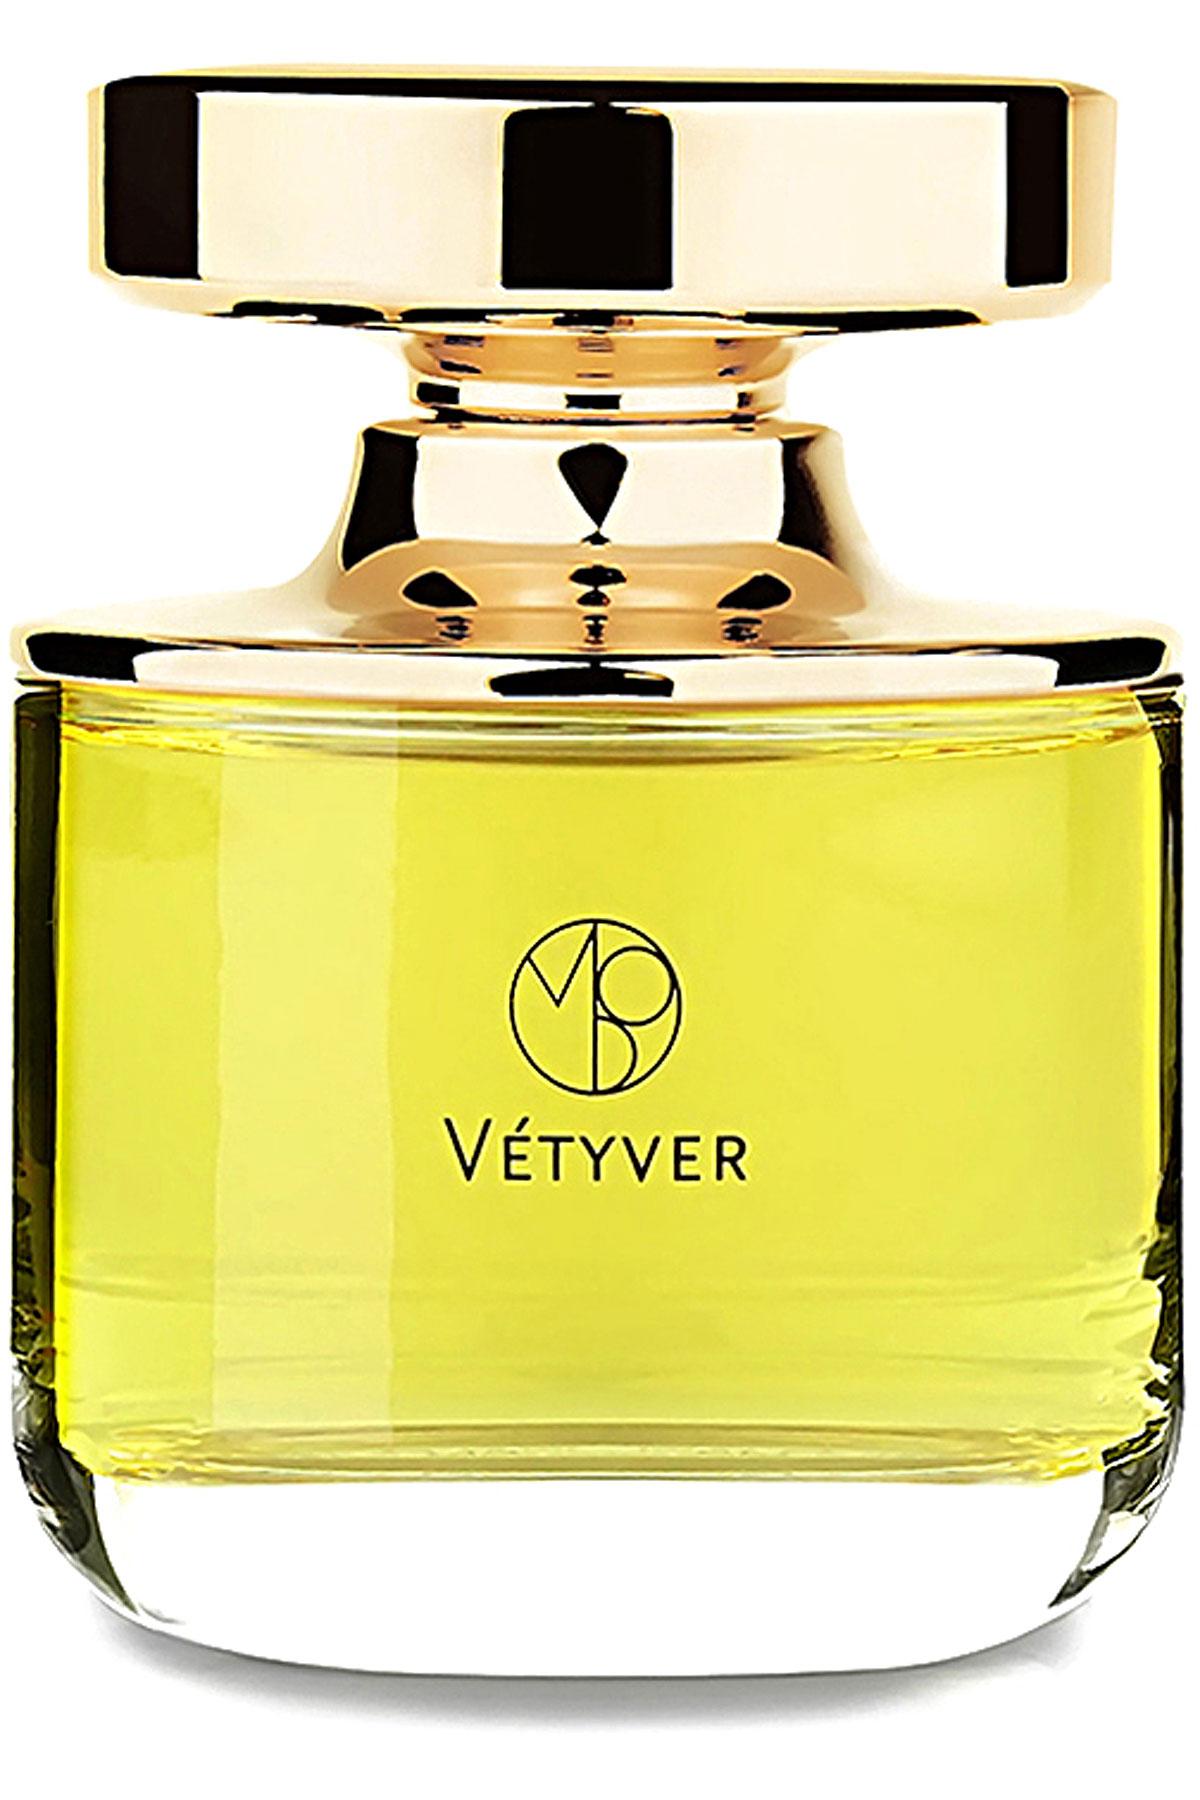 Mona Di Orio Духи для женщин, Vetyver - Eau De Parfum - 100 Ml, 2019, 75 Ml